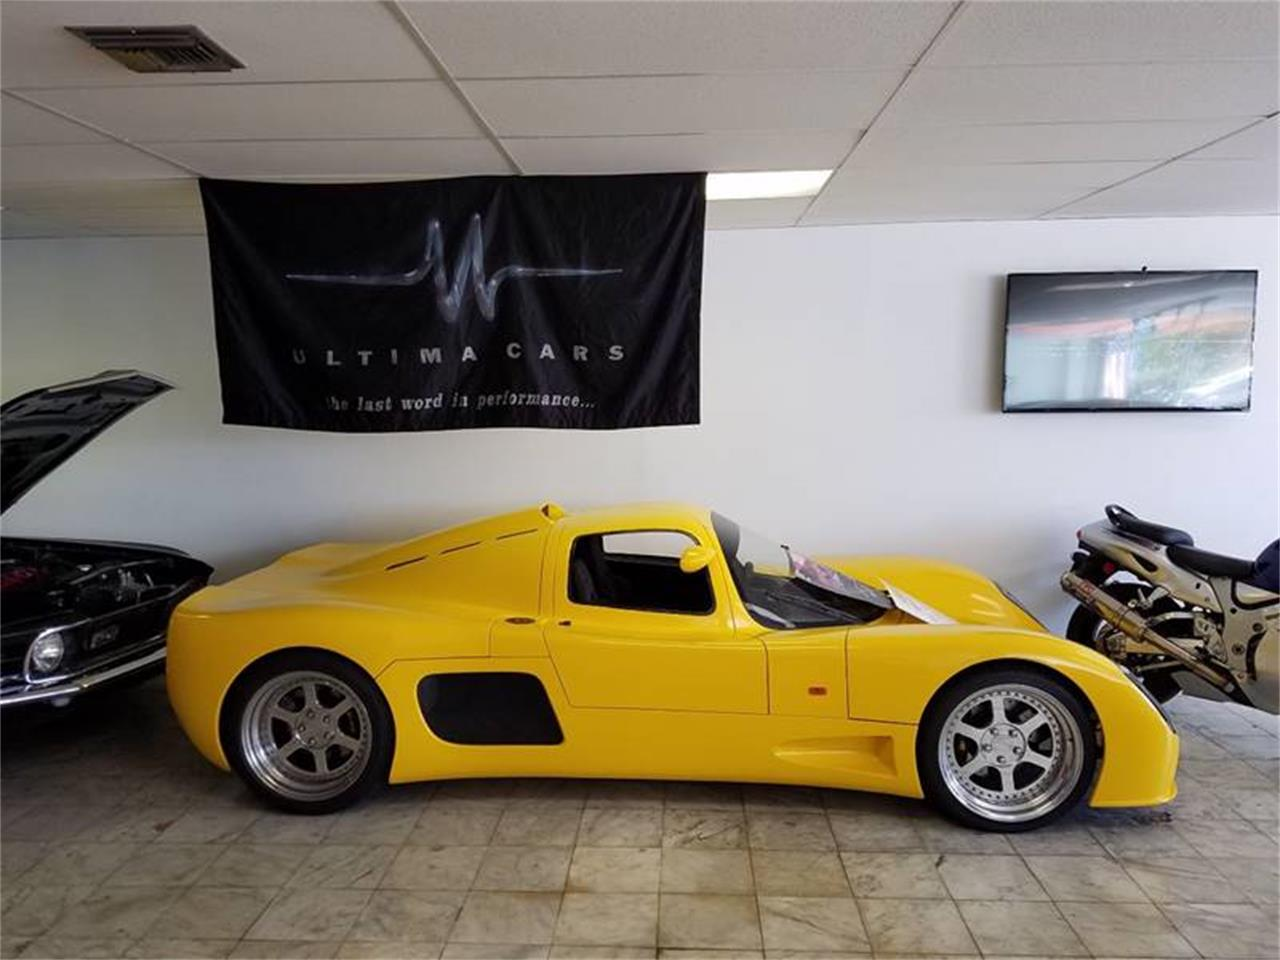 2000 Ultima GTR for Sale | ClassicCars.com | CC-1027266